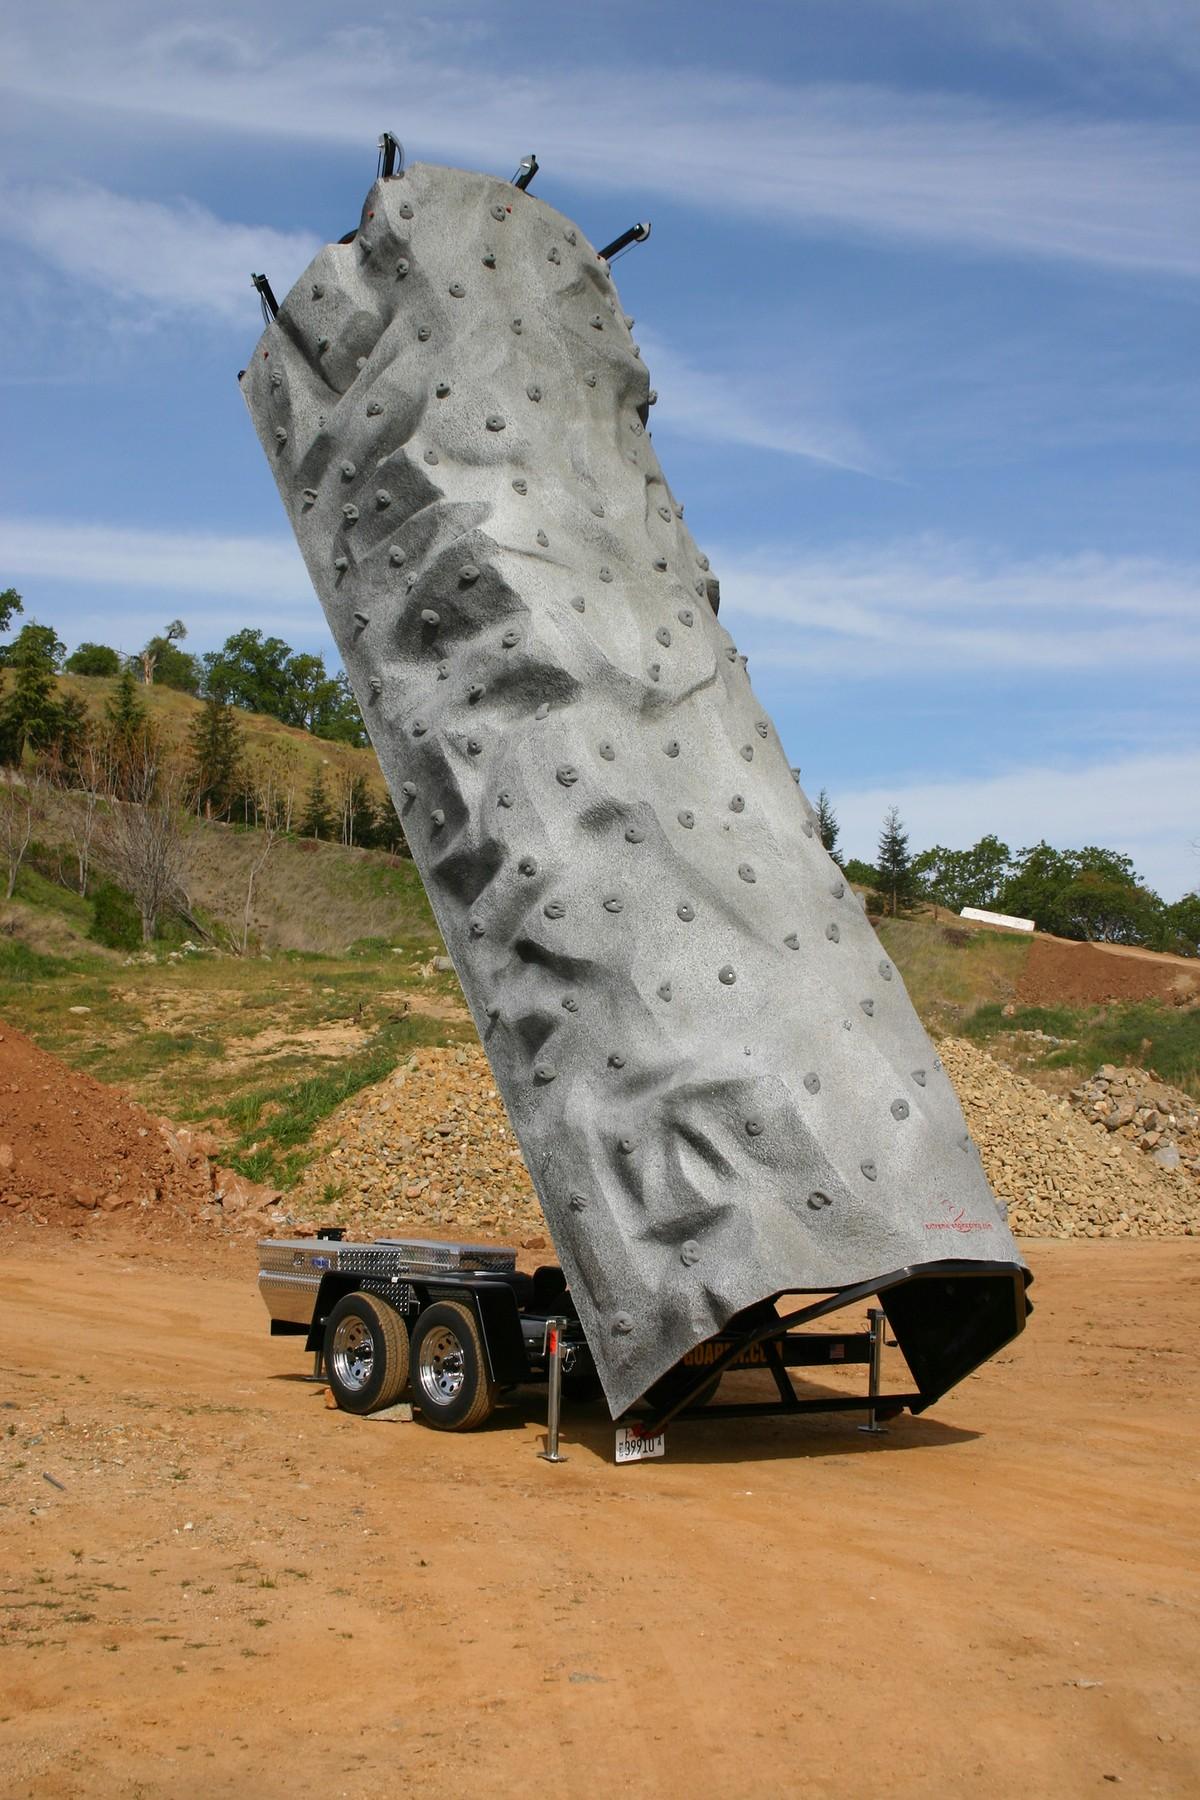 extreme-engineering-mobile-climbing-wall-hero-11.jpg